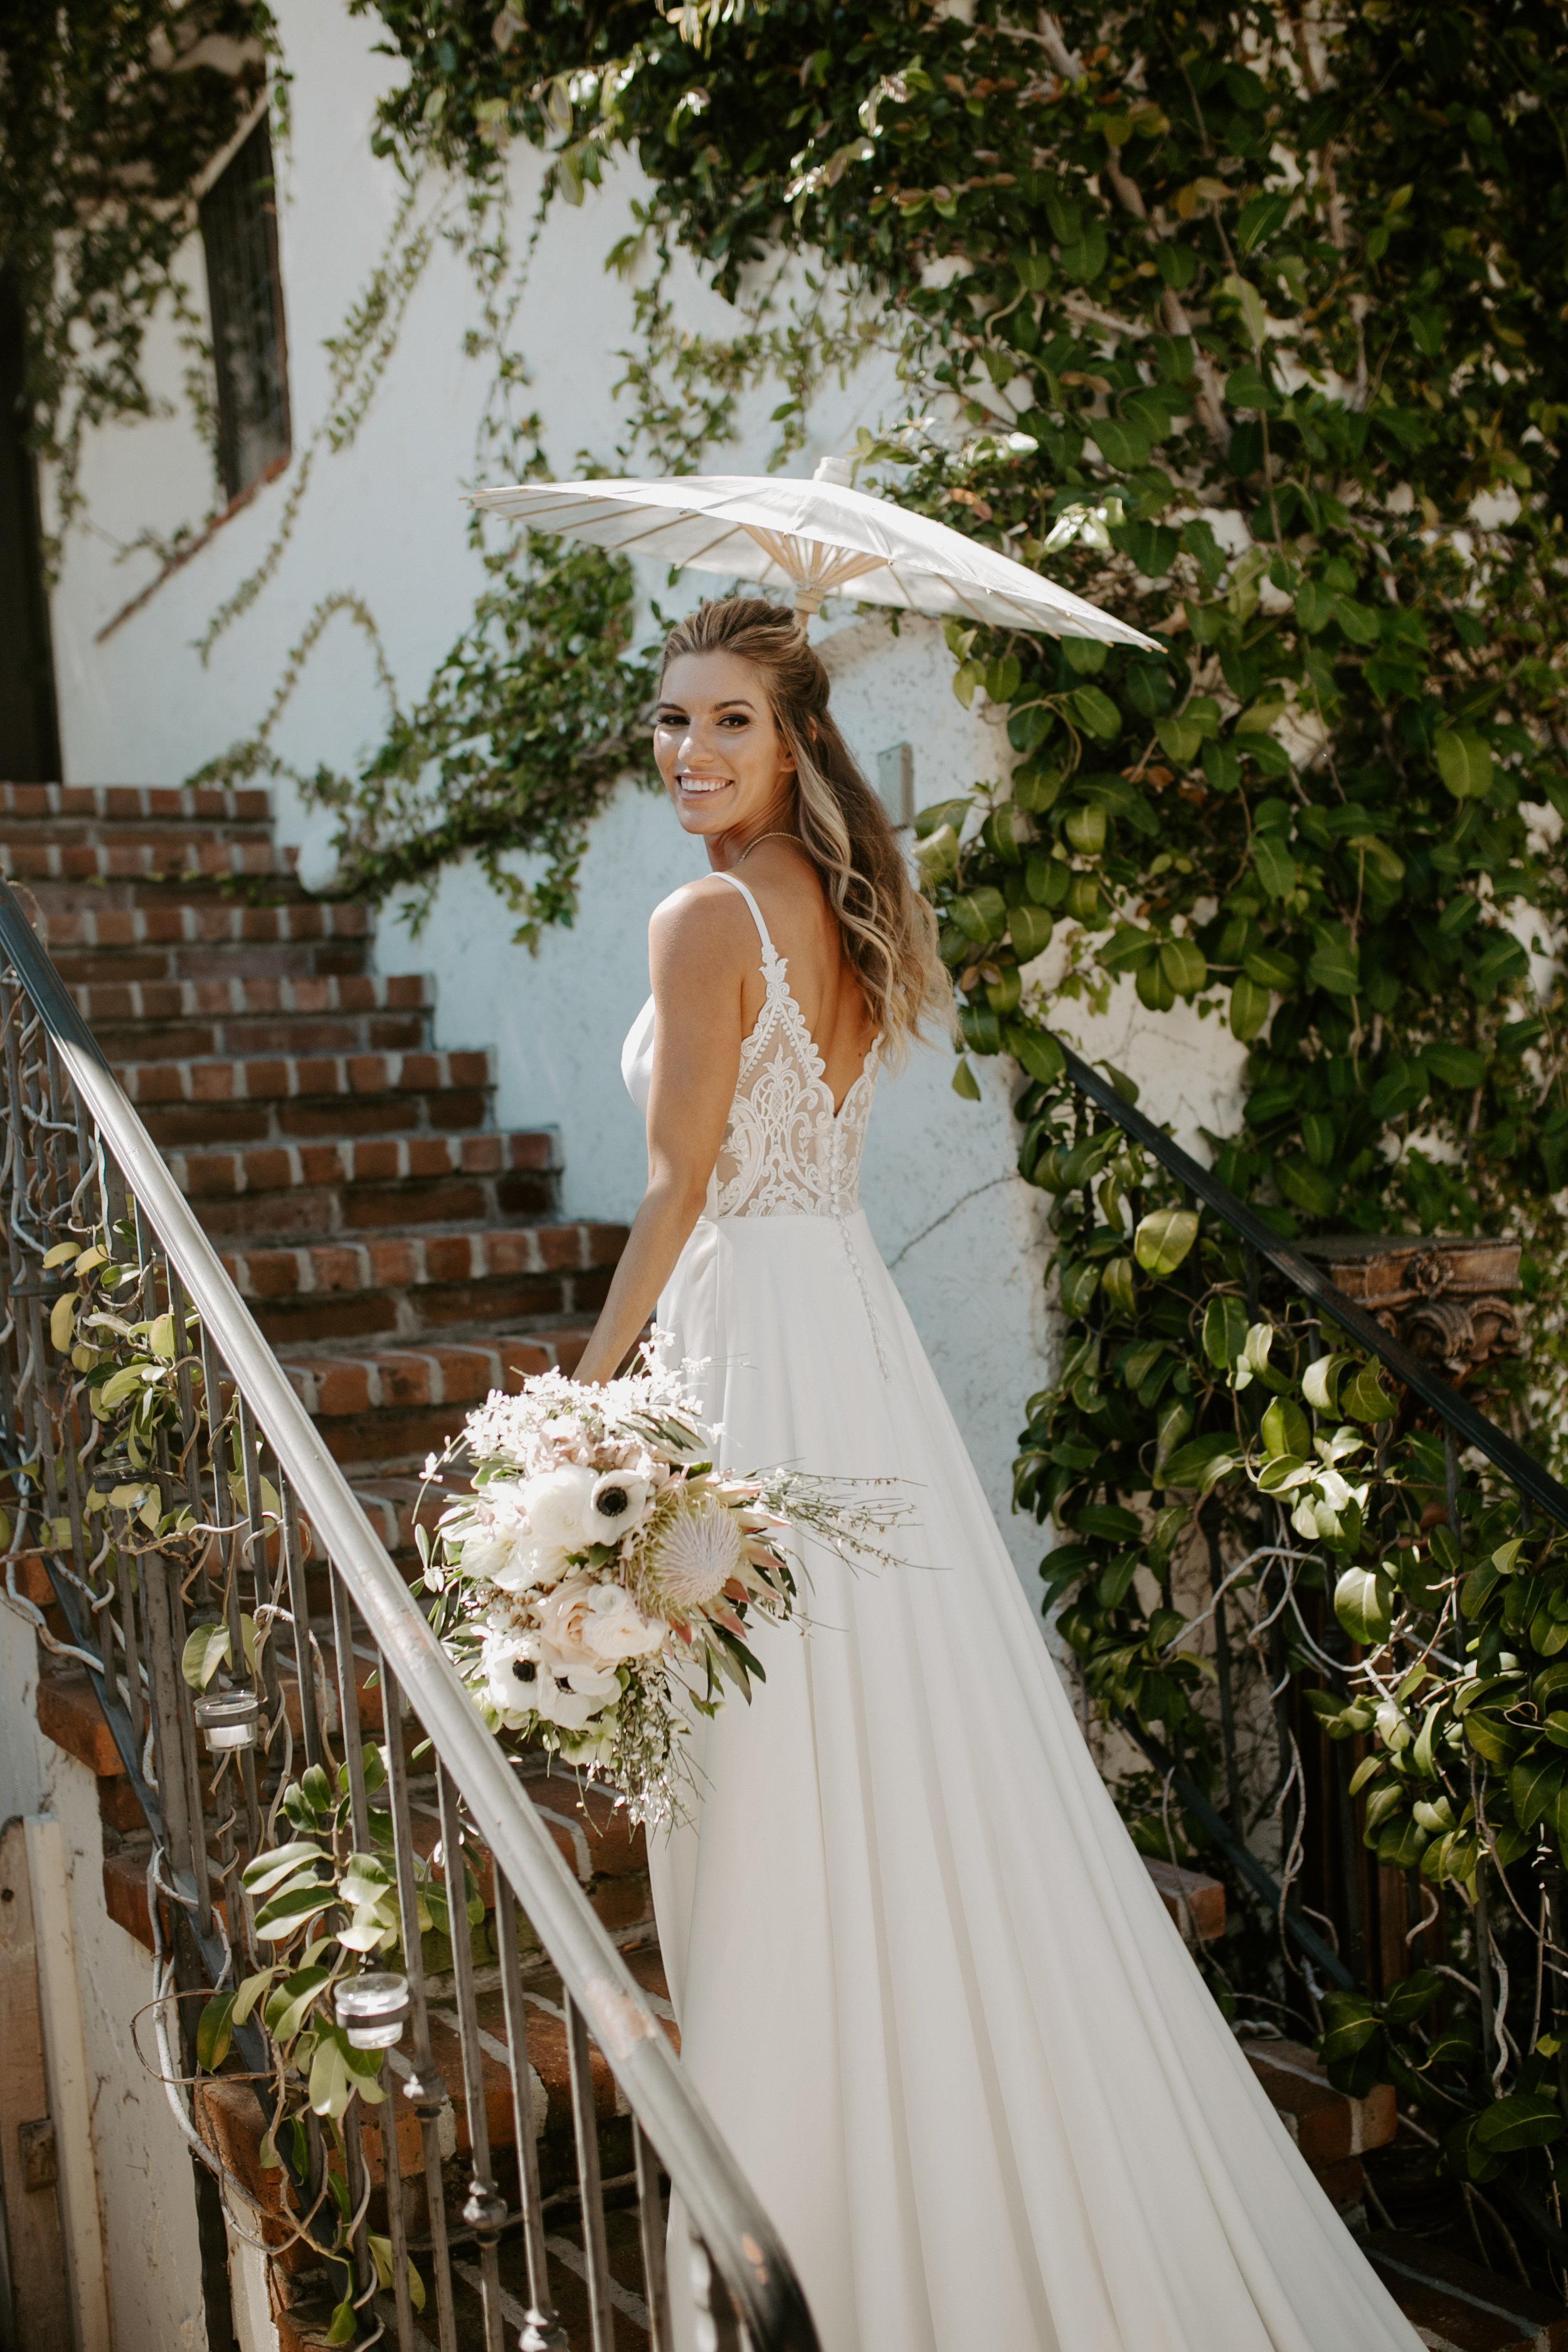 pinkfeatherphotography-SanJuanCapistrano-wedding  (260 of 1023).jpg